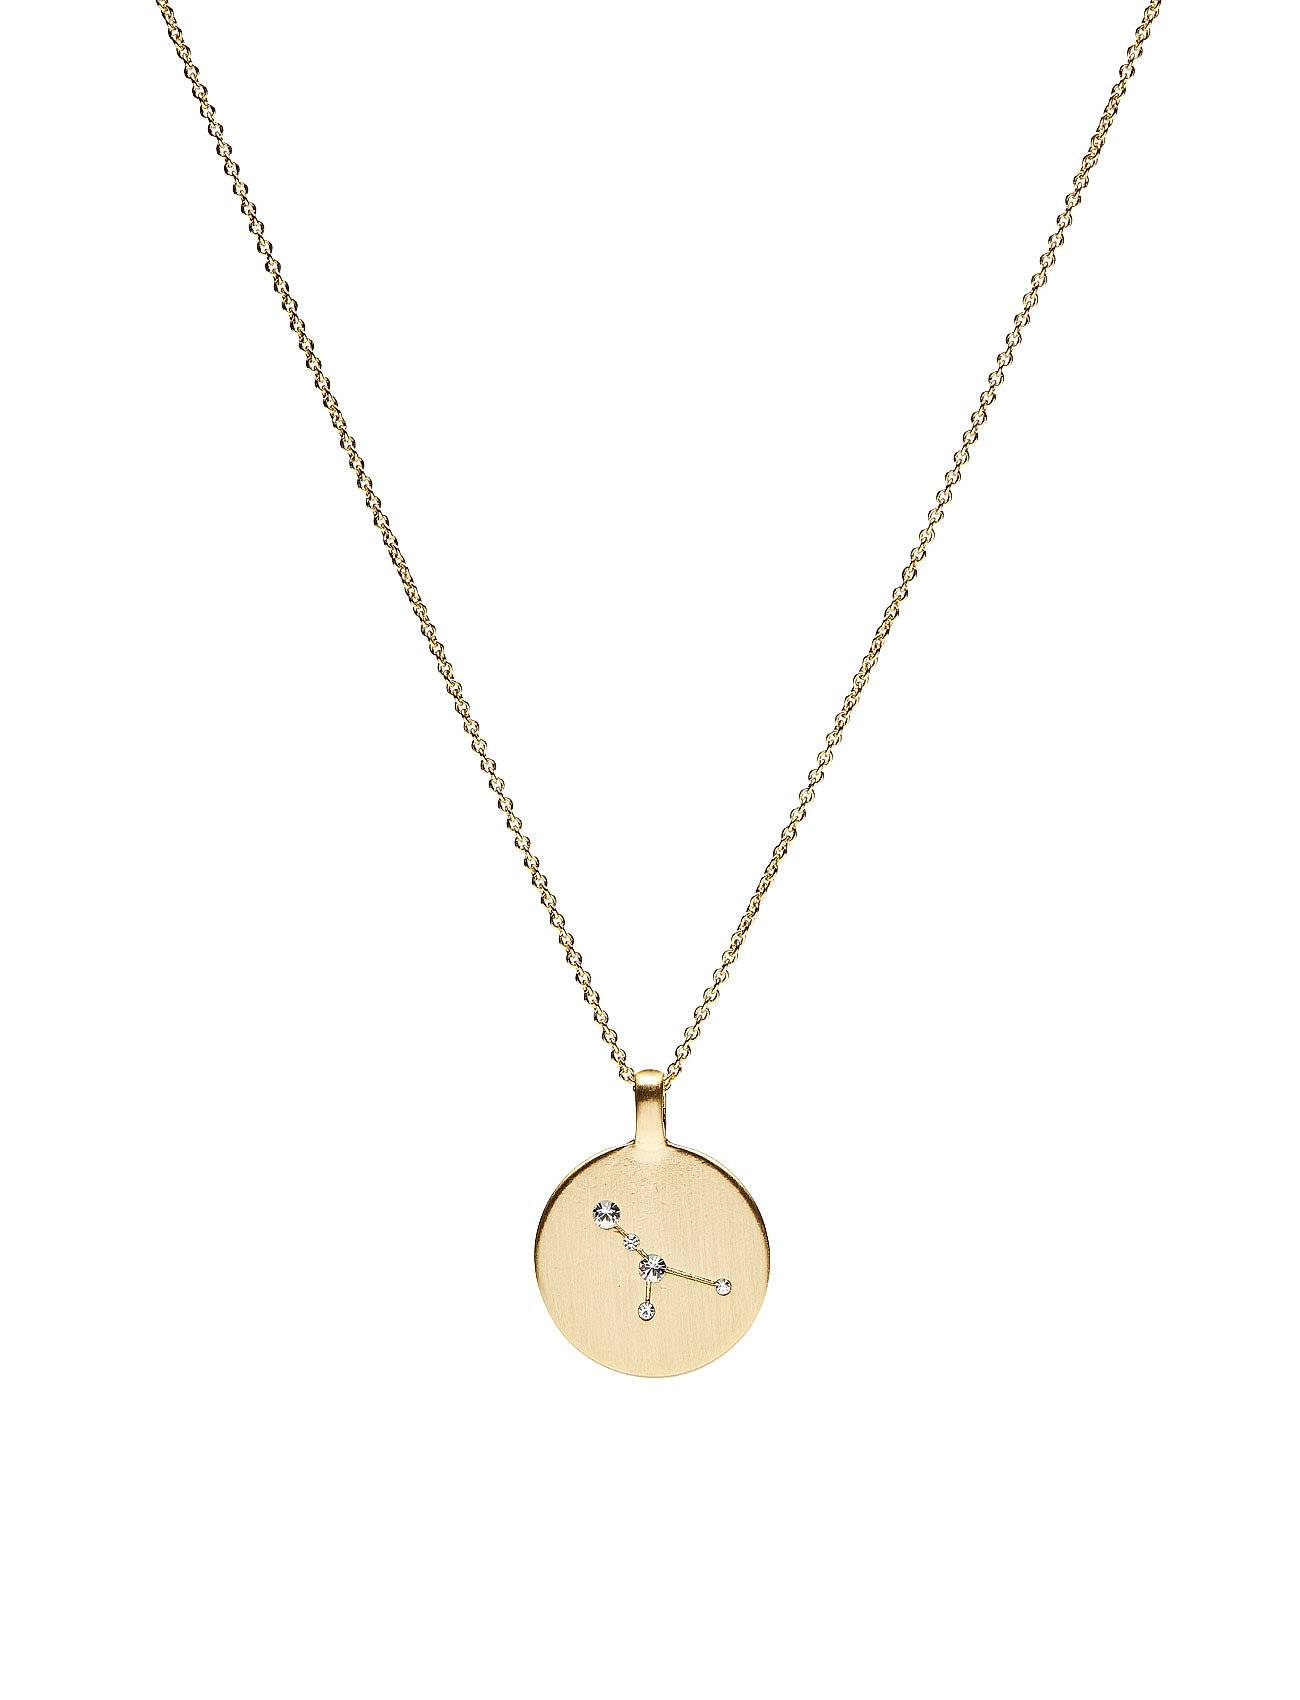 Pilgrim Necklace - Cancer Accessories Jewellery Necklaces Dainty Necklaces Kulta Pilgrim